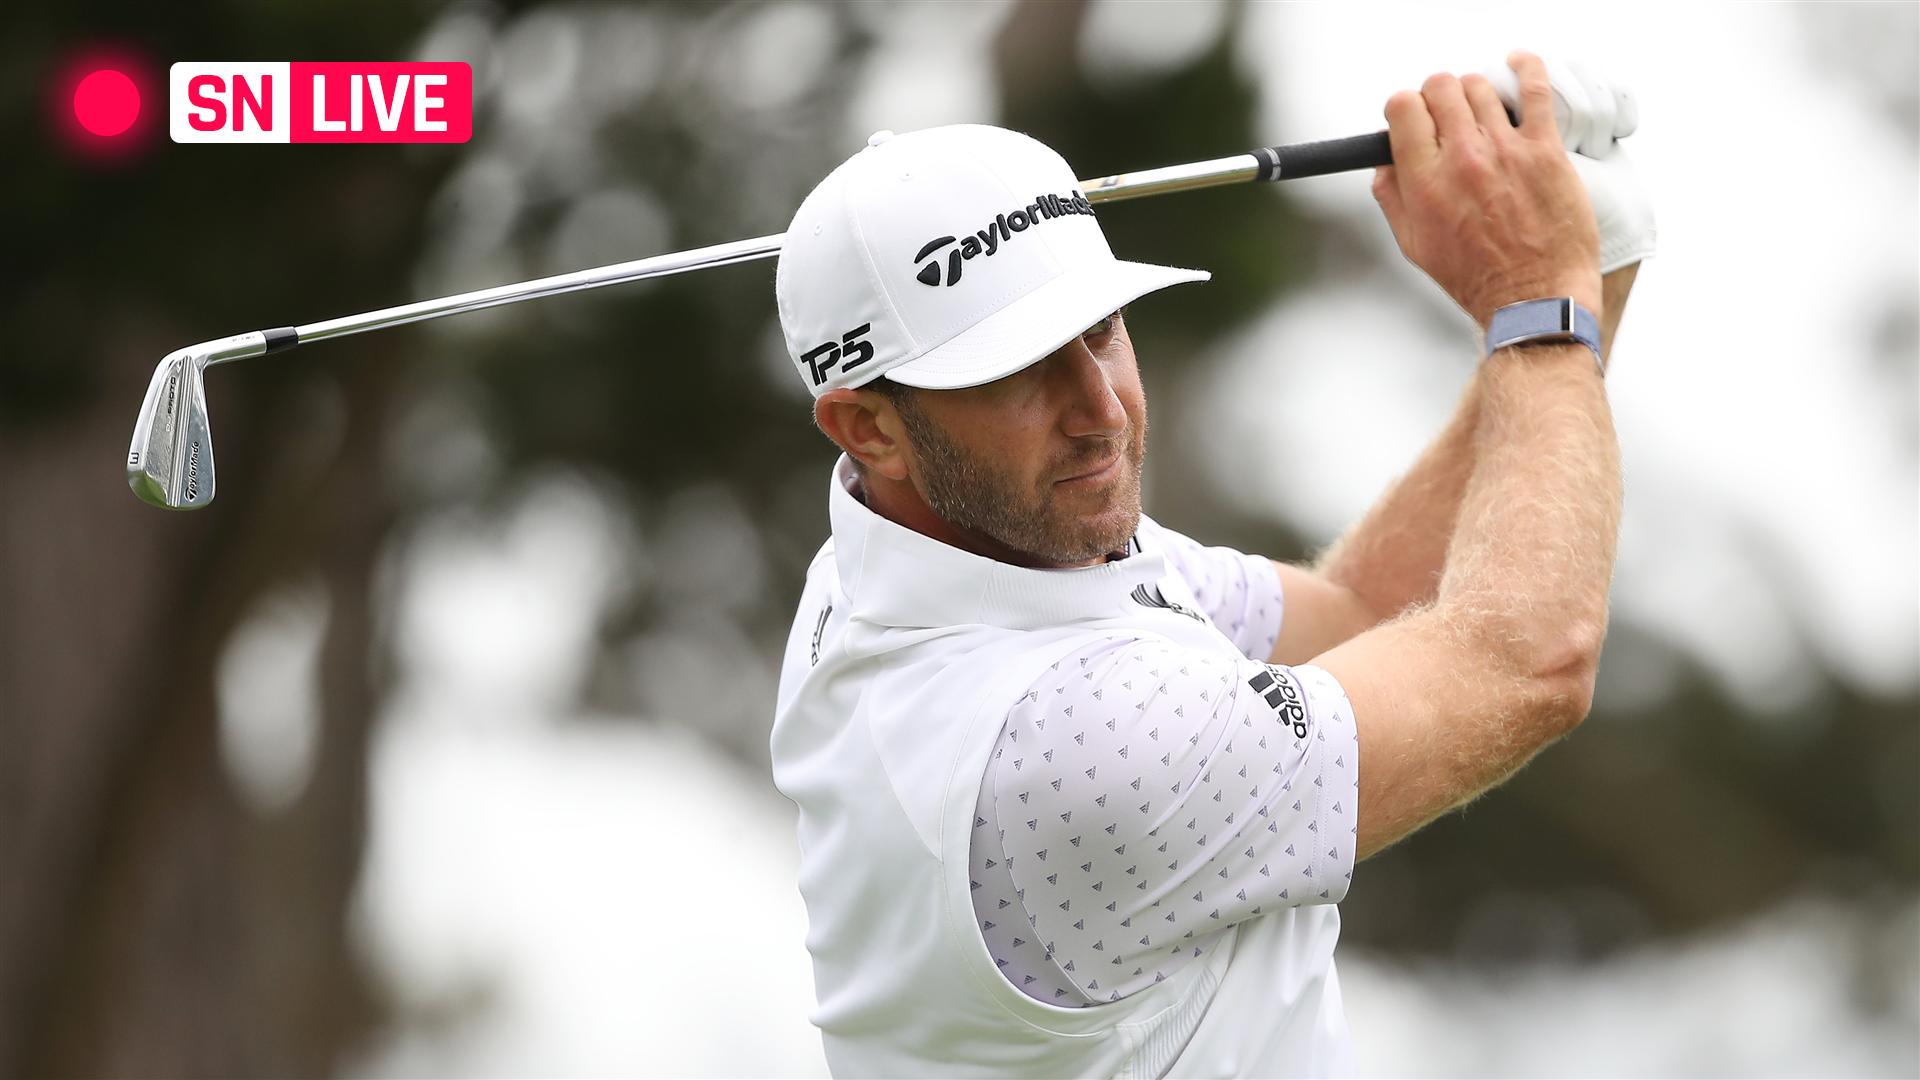 PGA Championship live golf scores, updates, highlights from Sunday